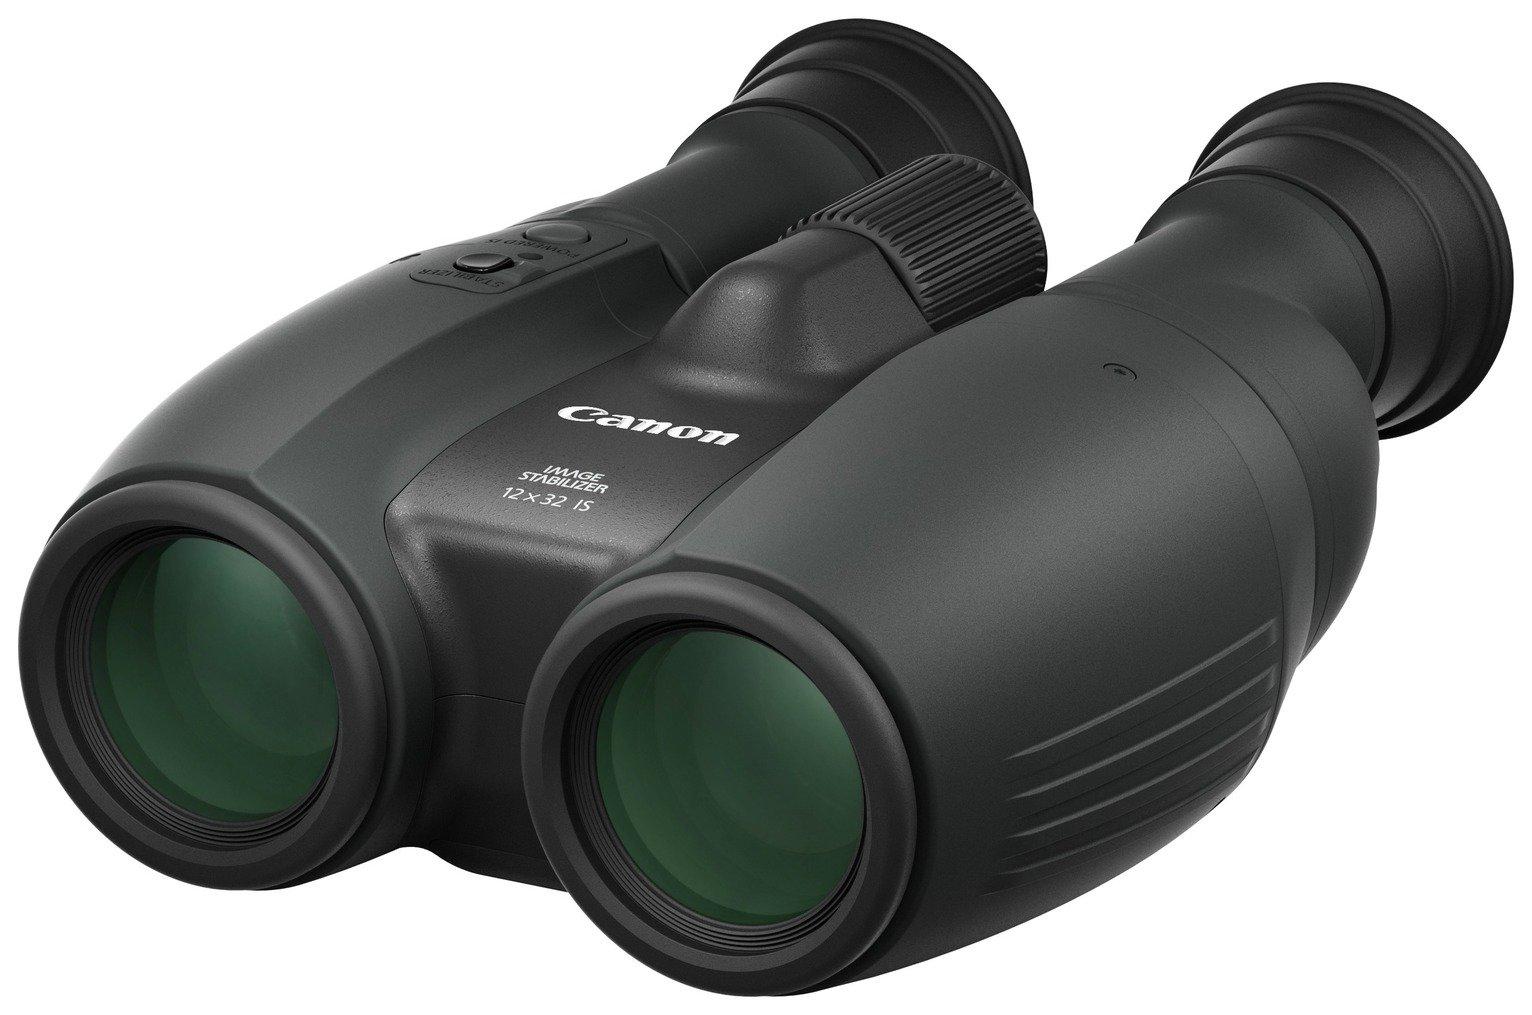 Canon 12 x 32 IS Binoculars